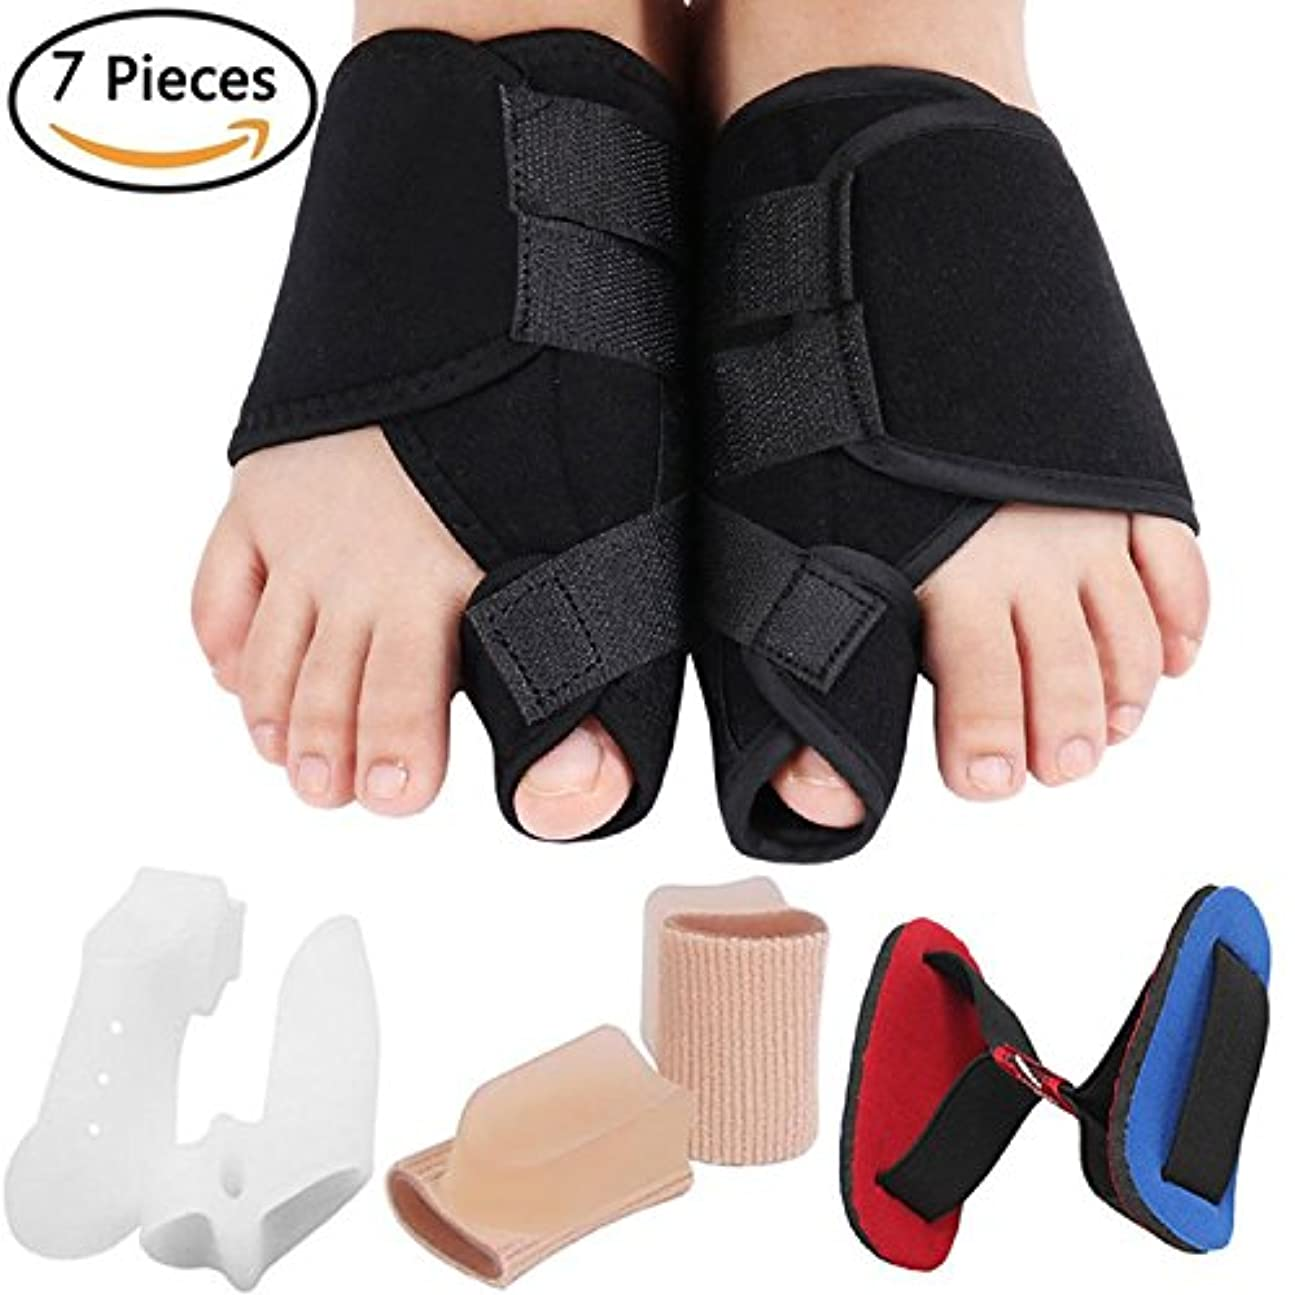 Bunion Corrector Bunion Relief Kit, Bunion Splint Toe Straightener Corrector for Hallux Valgus, Big Toe Joint,...